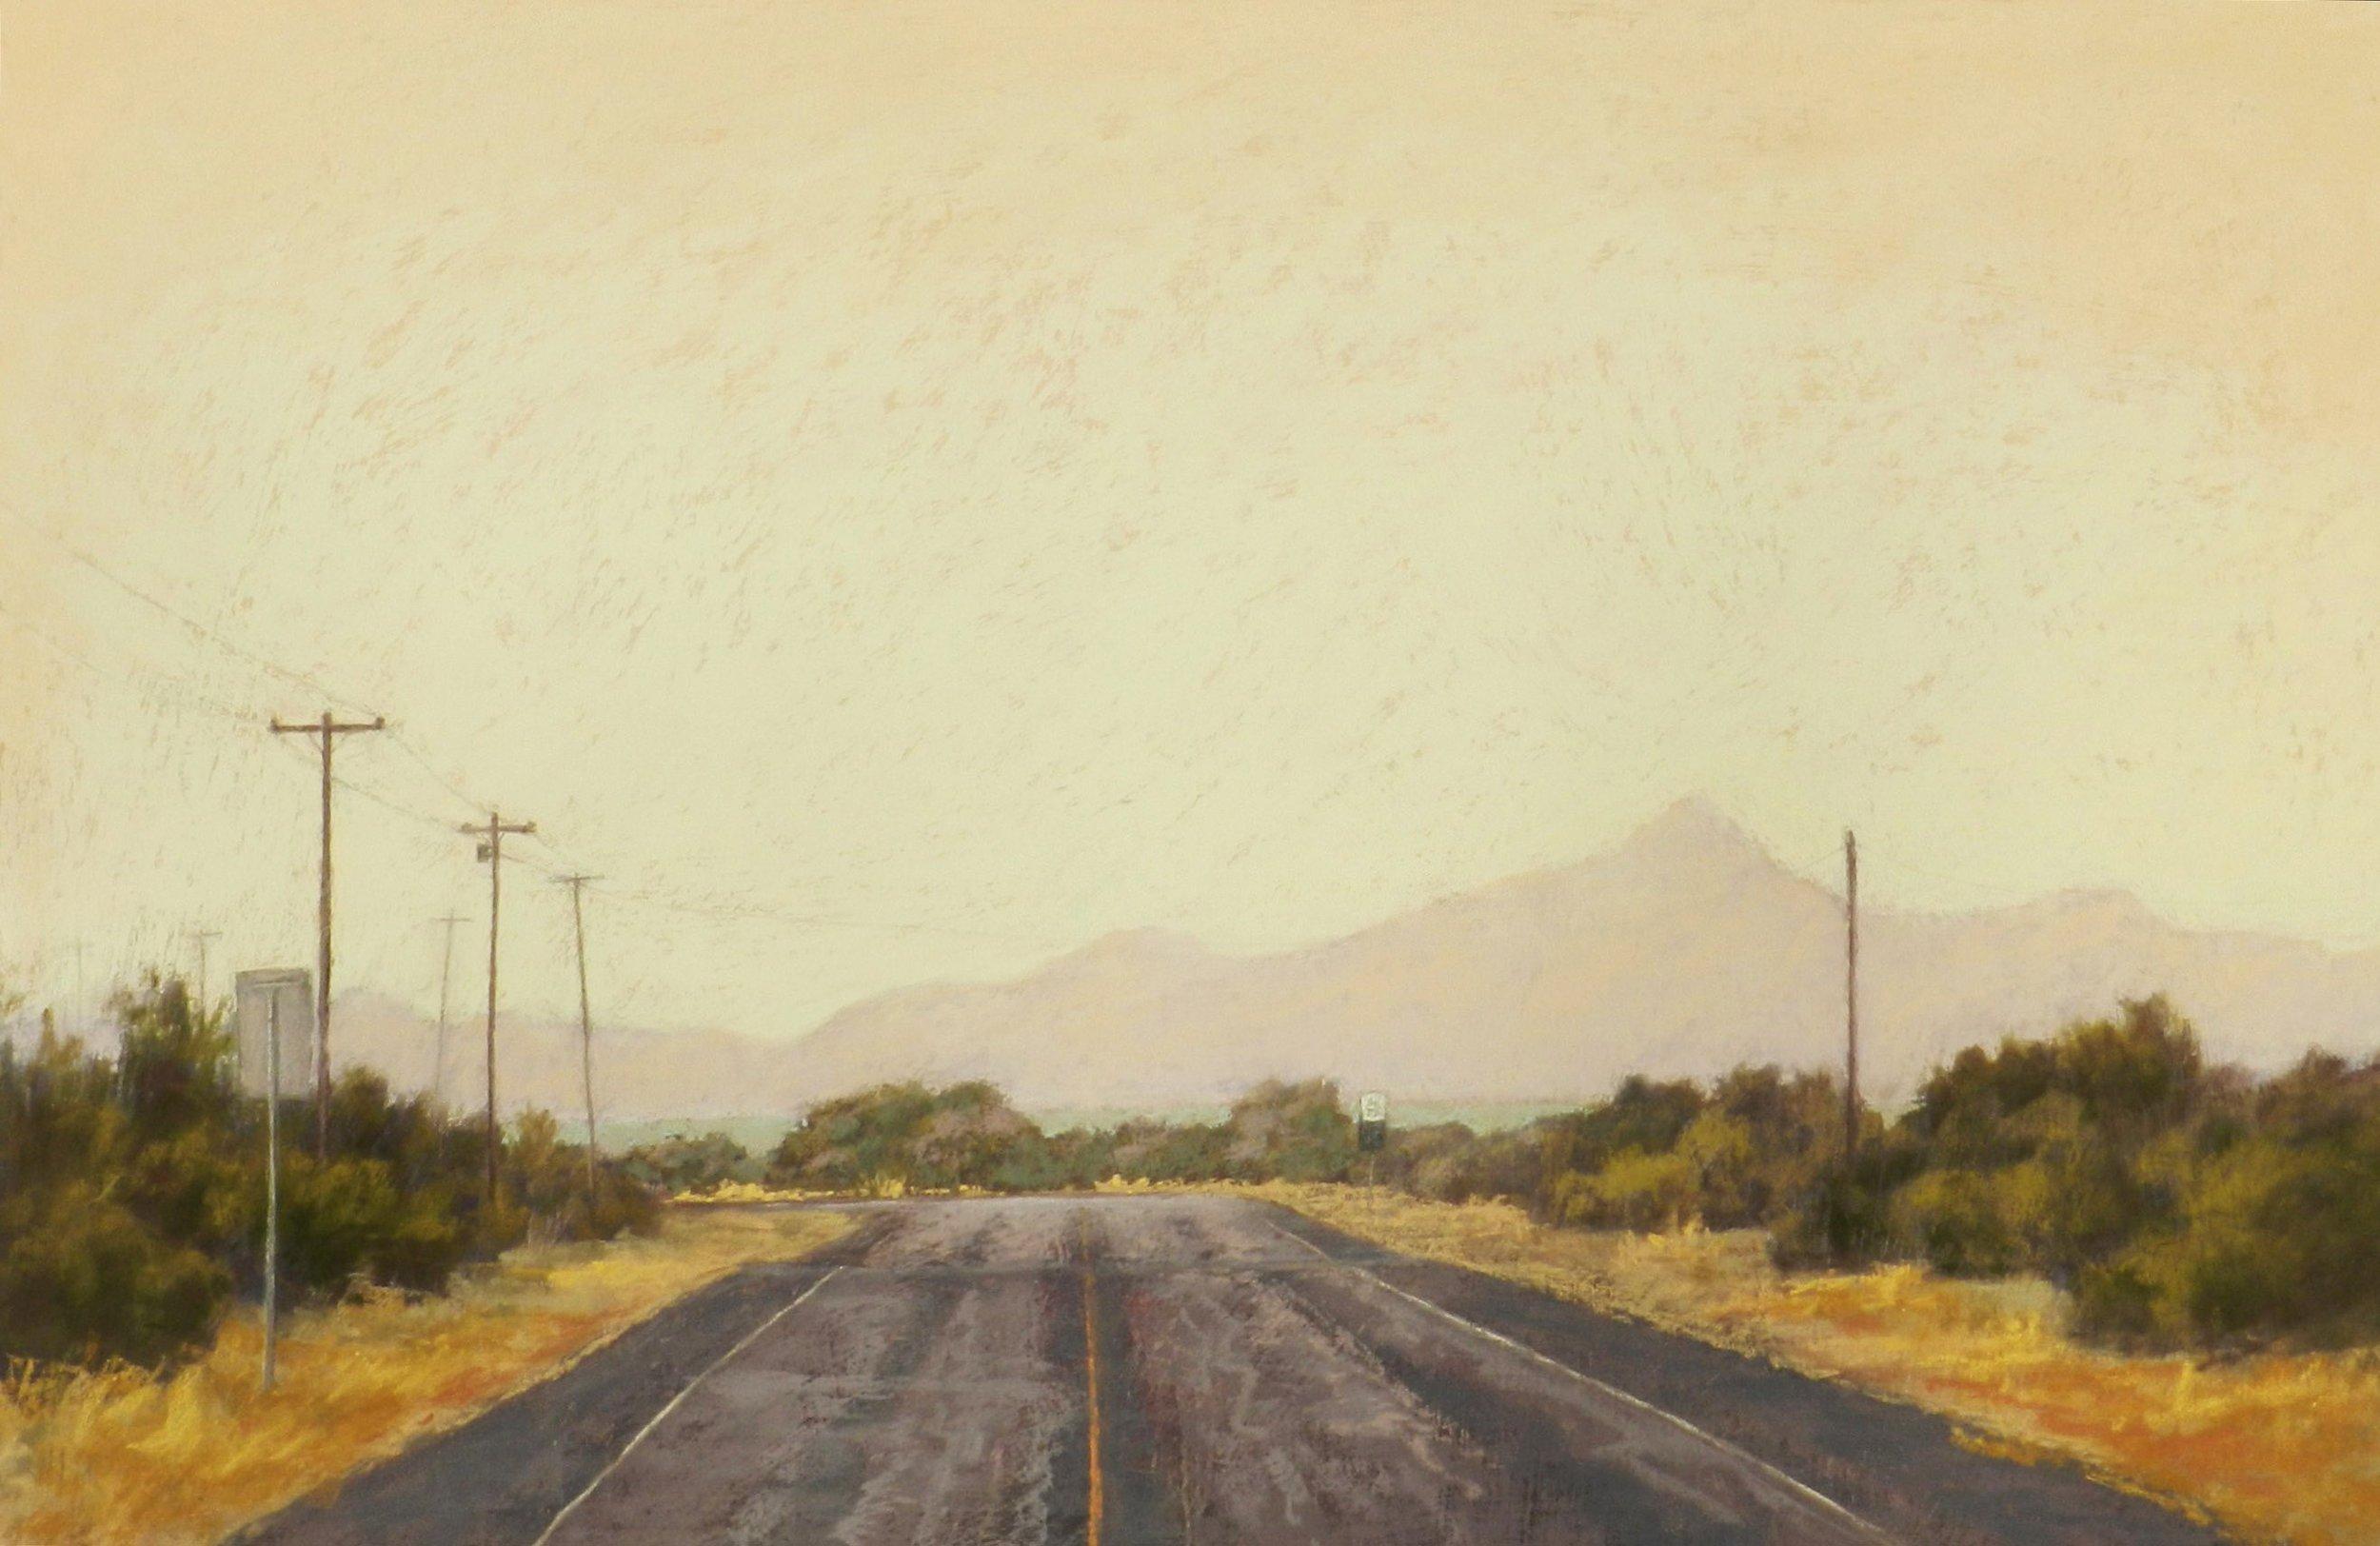 Jeri Salter,  Looking through the Haze , 2012, pastel on board, Courtesy of William Reaves I Sarah Foltz Fine Art.